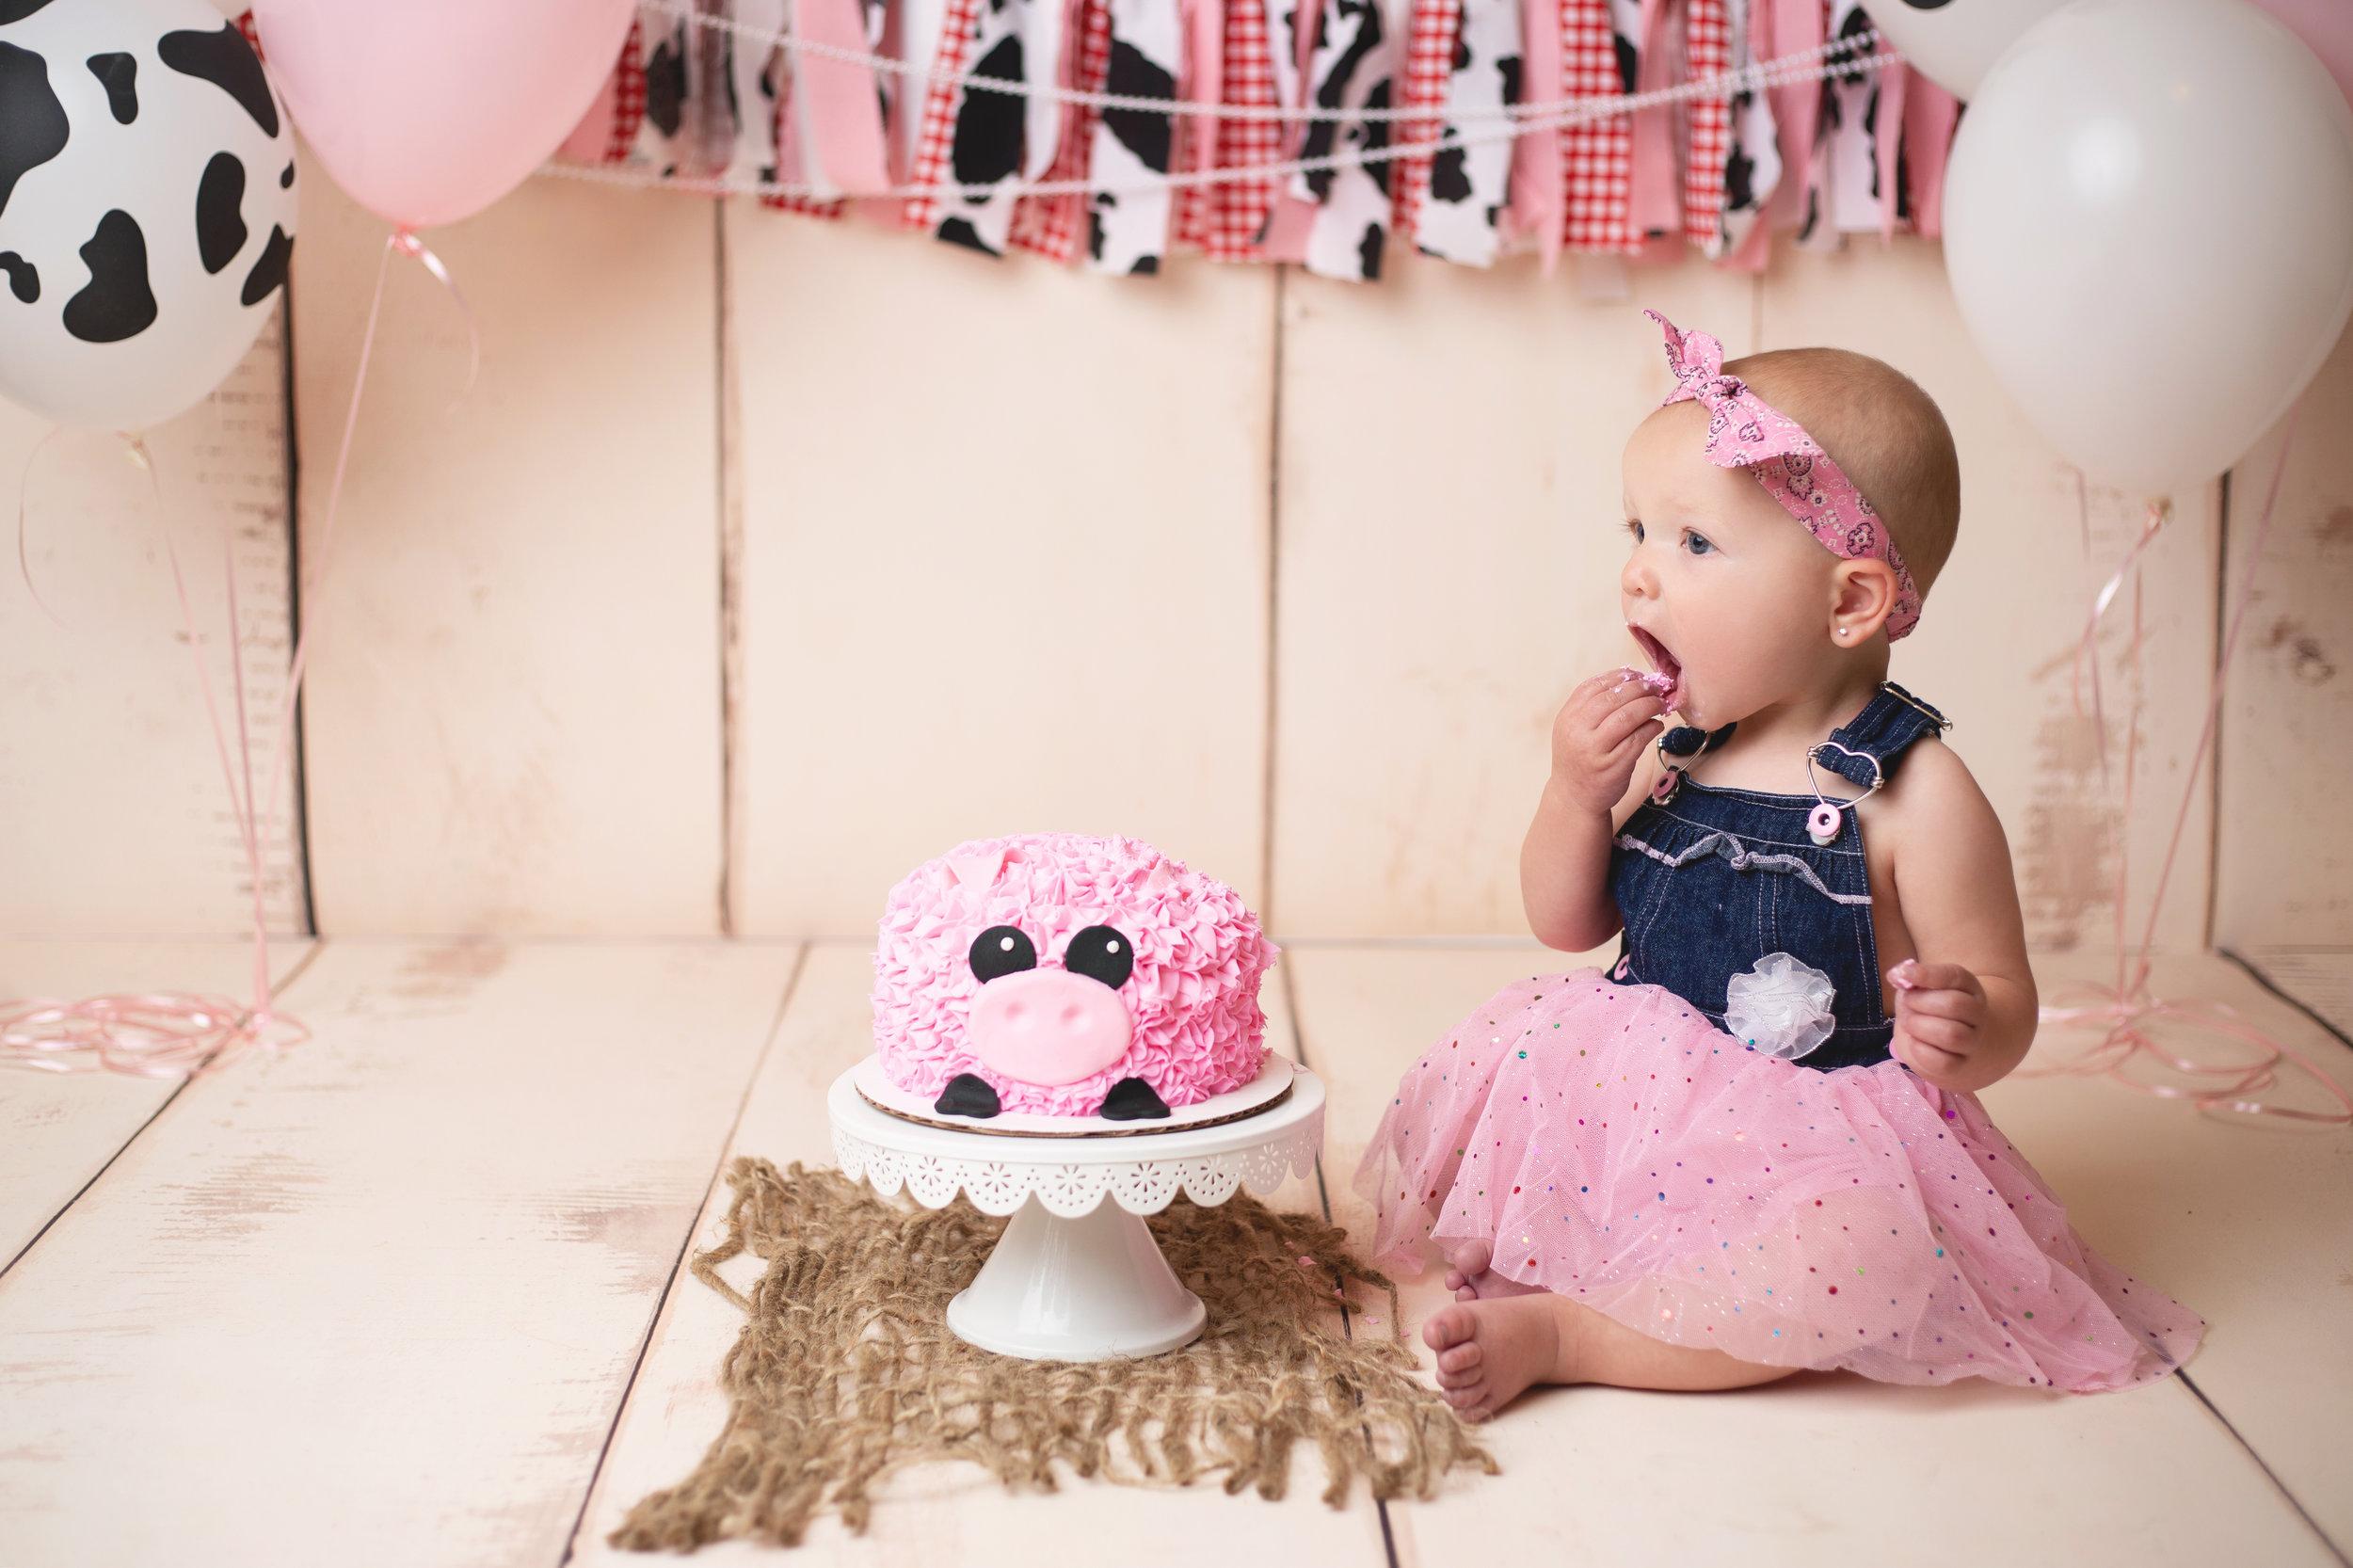 anchorage-cake-smash-photographer-2.jpg